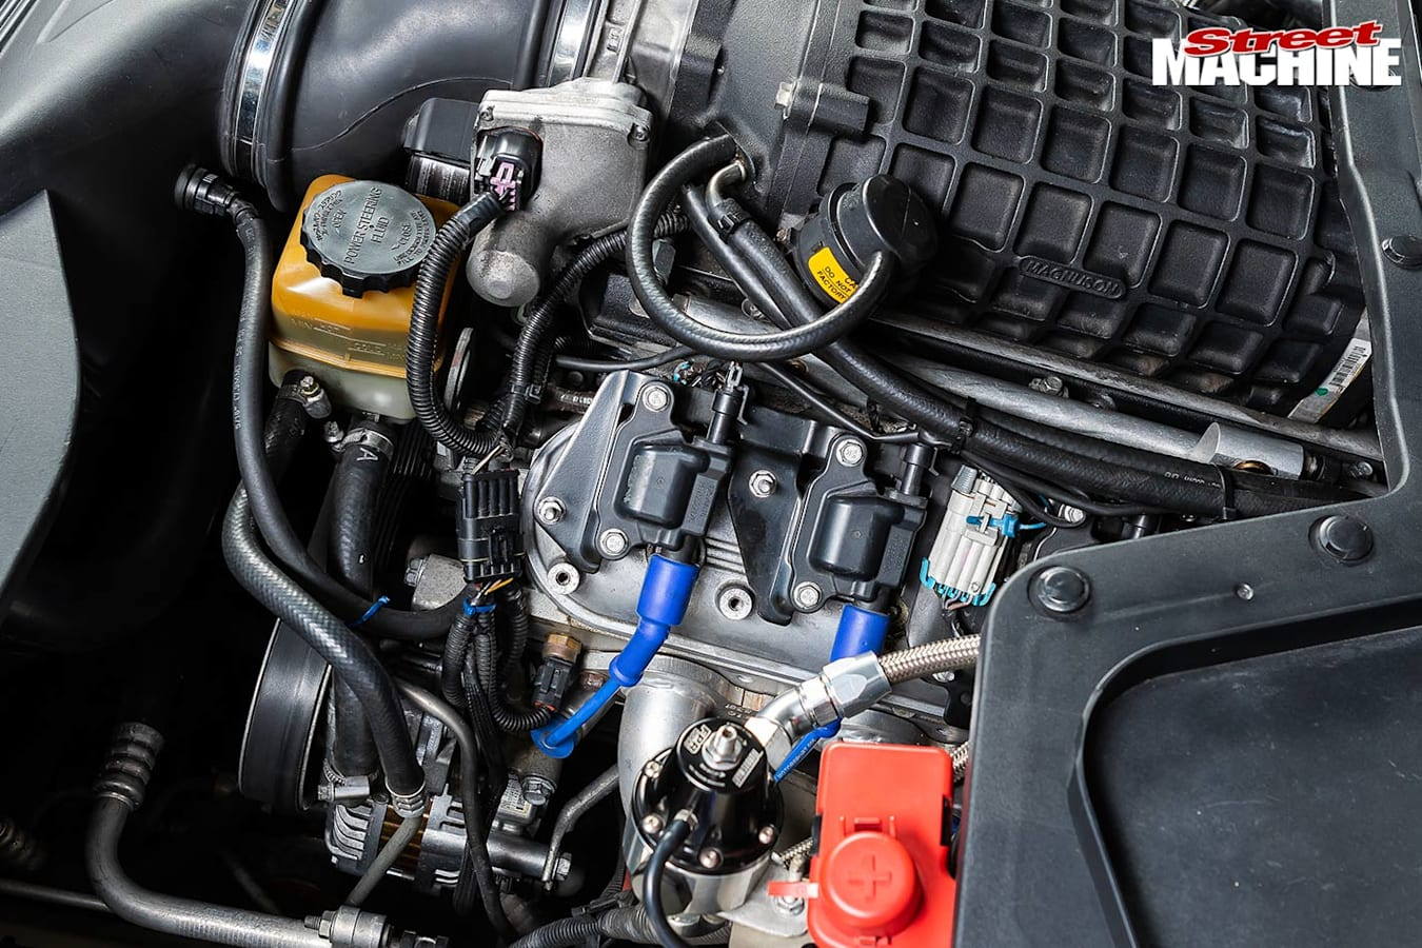 Holden VE Calais engine bay